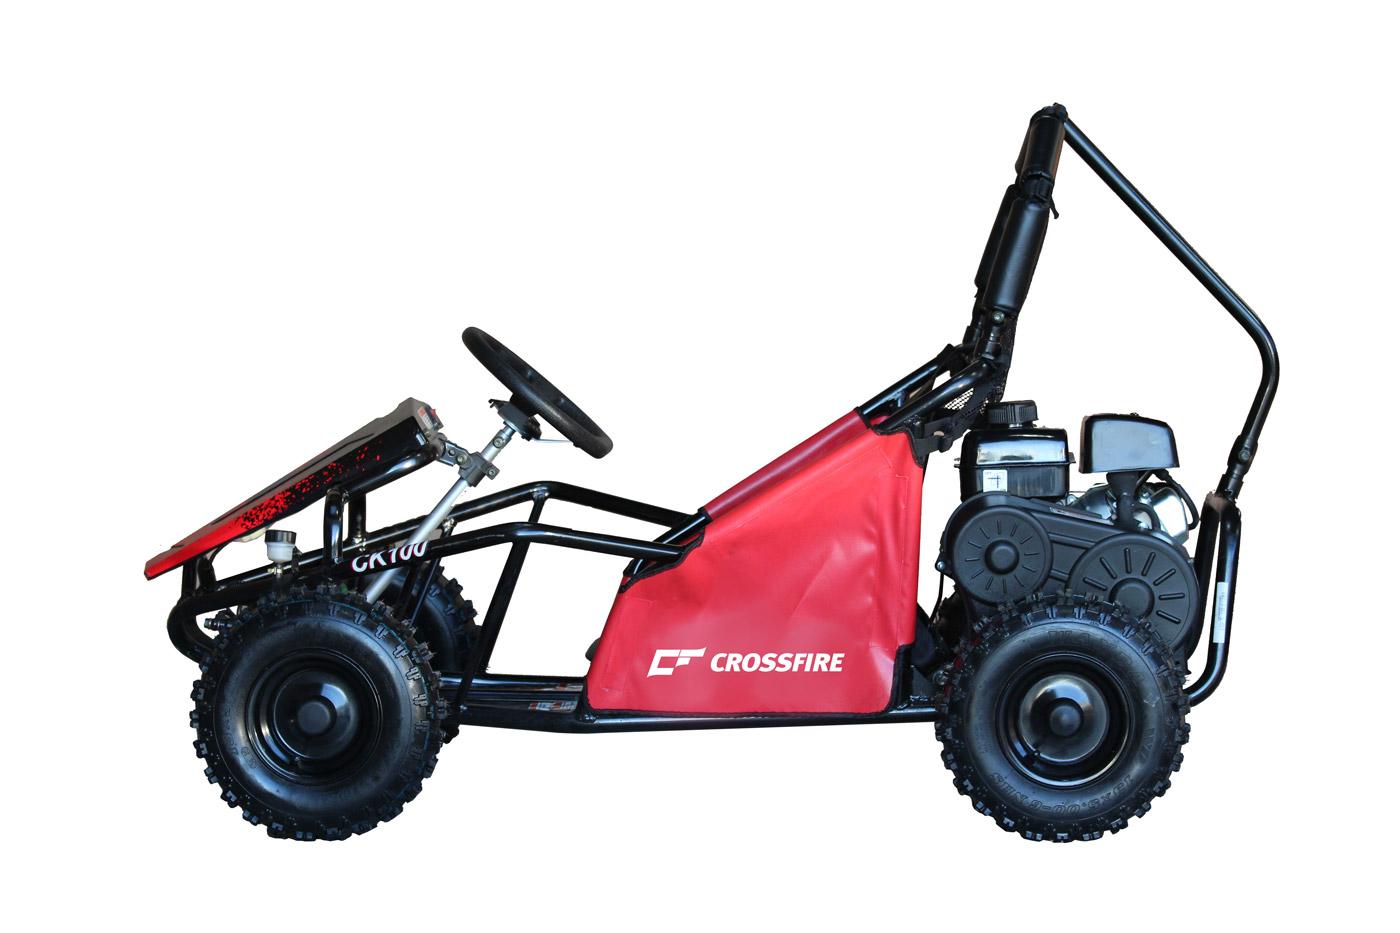 crossfire-go-kart-100-red-black-side